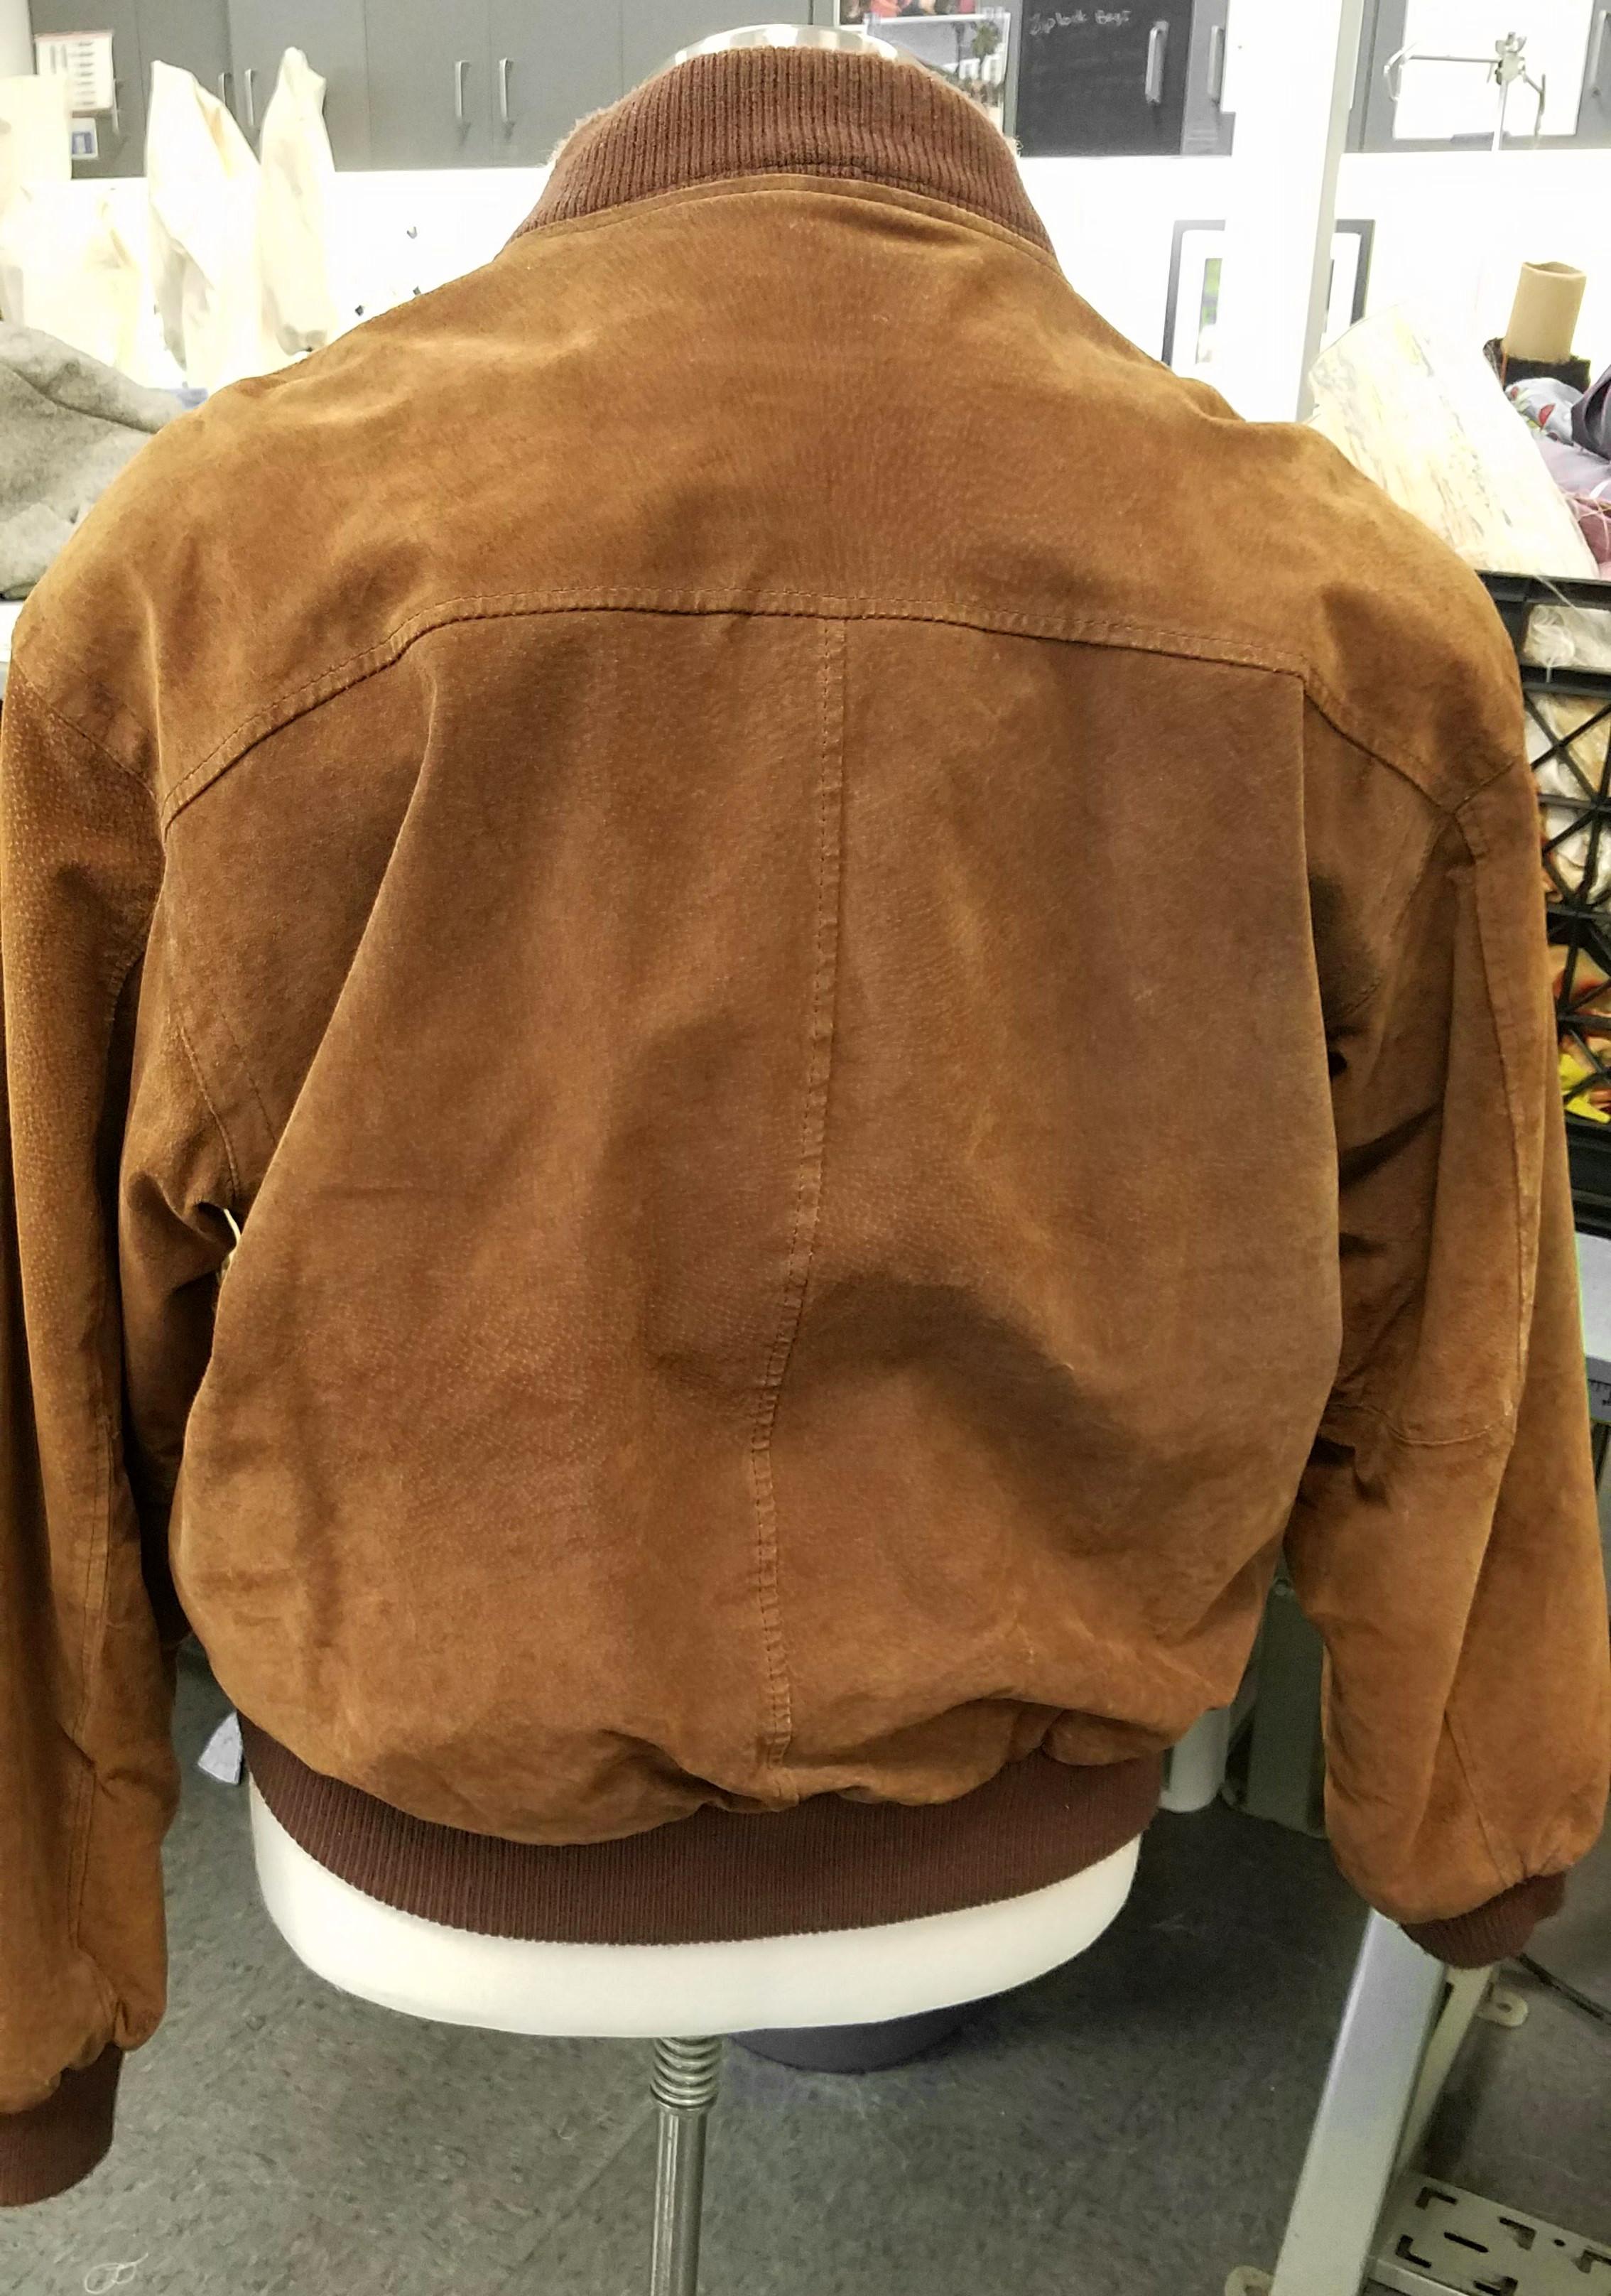 original back.png